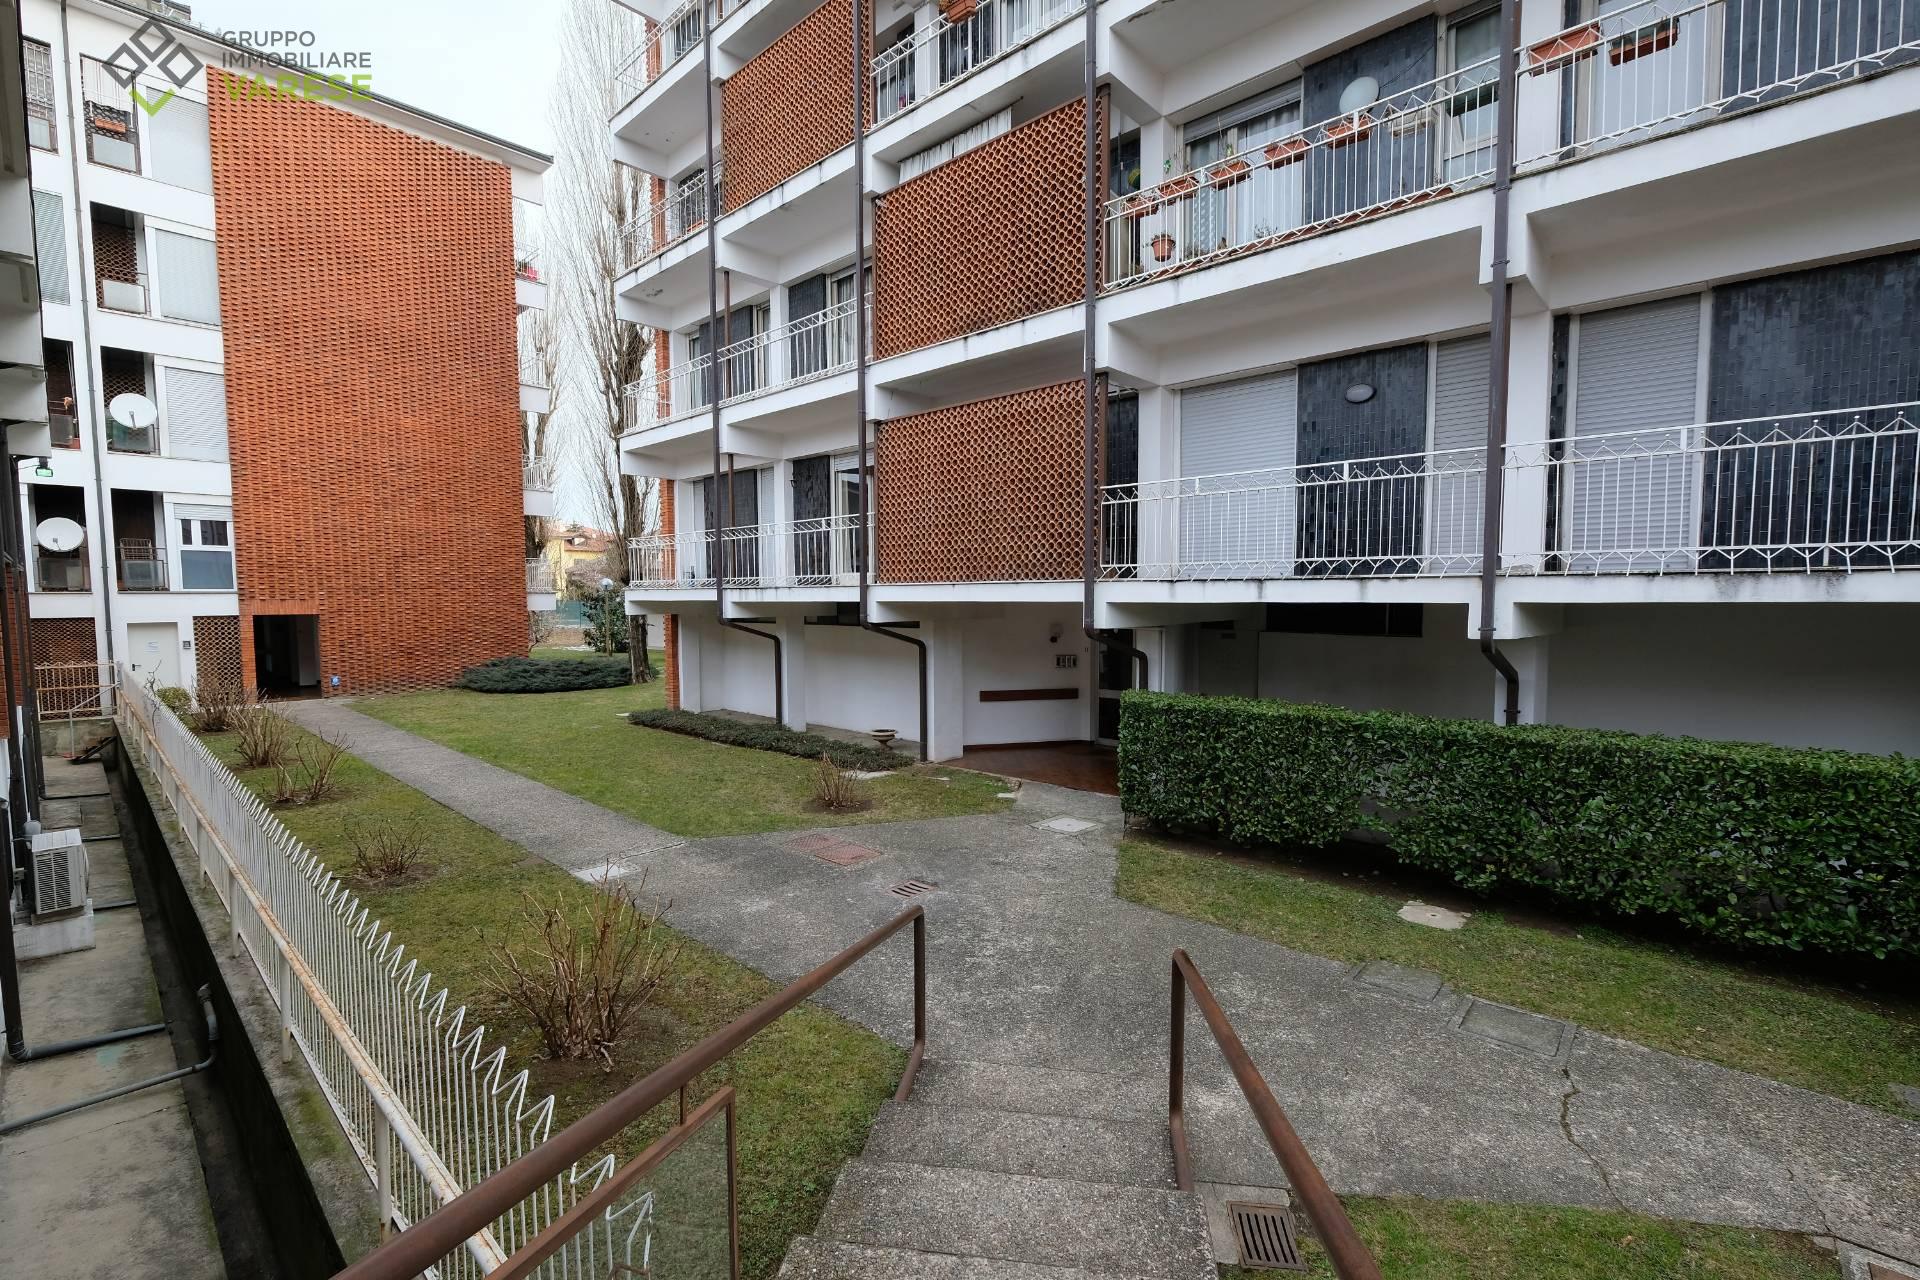 varese vendita quart: bizzozzero gruppo-immobiliare-varese-srls